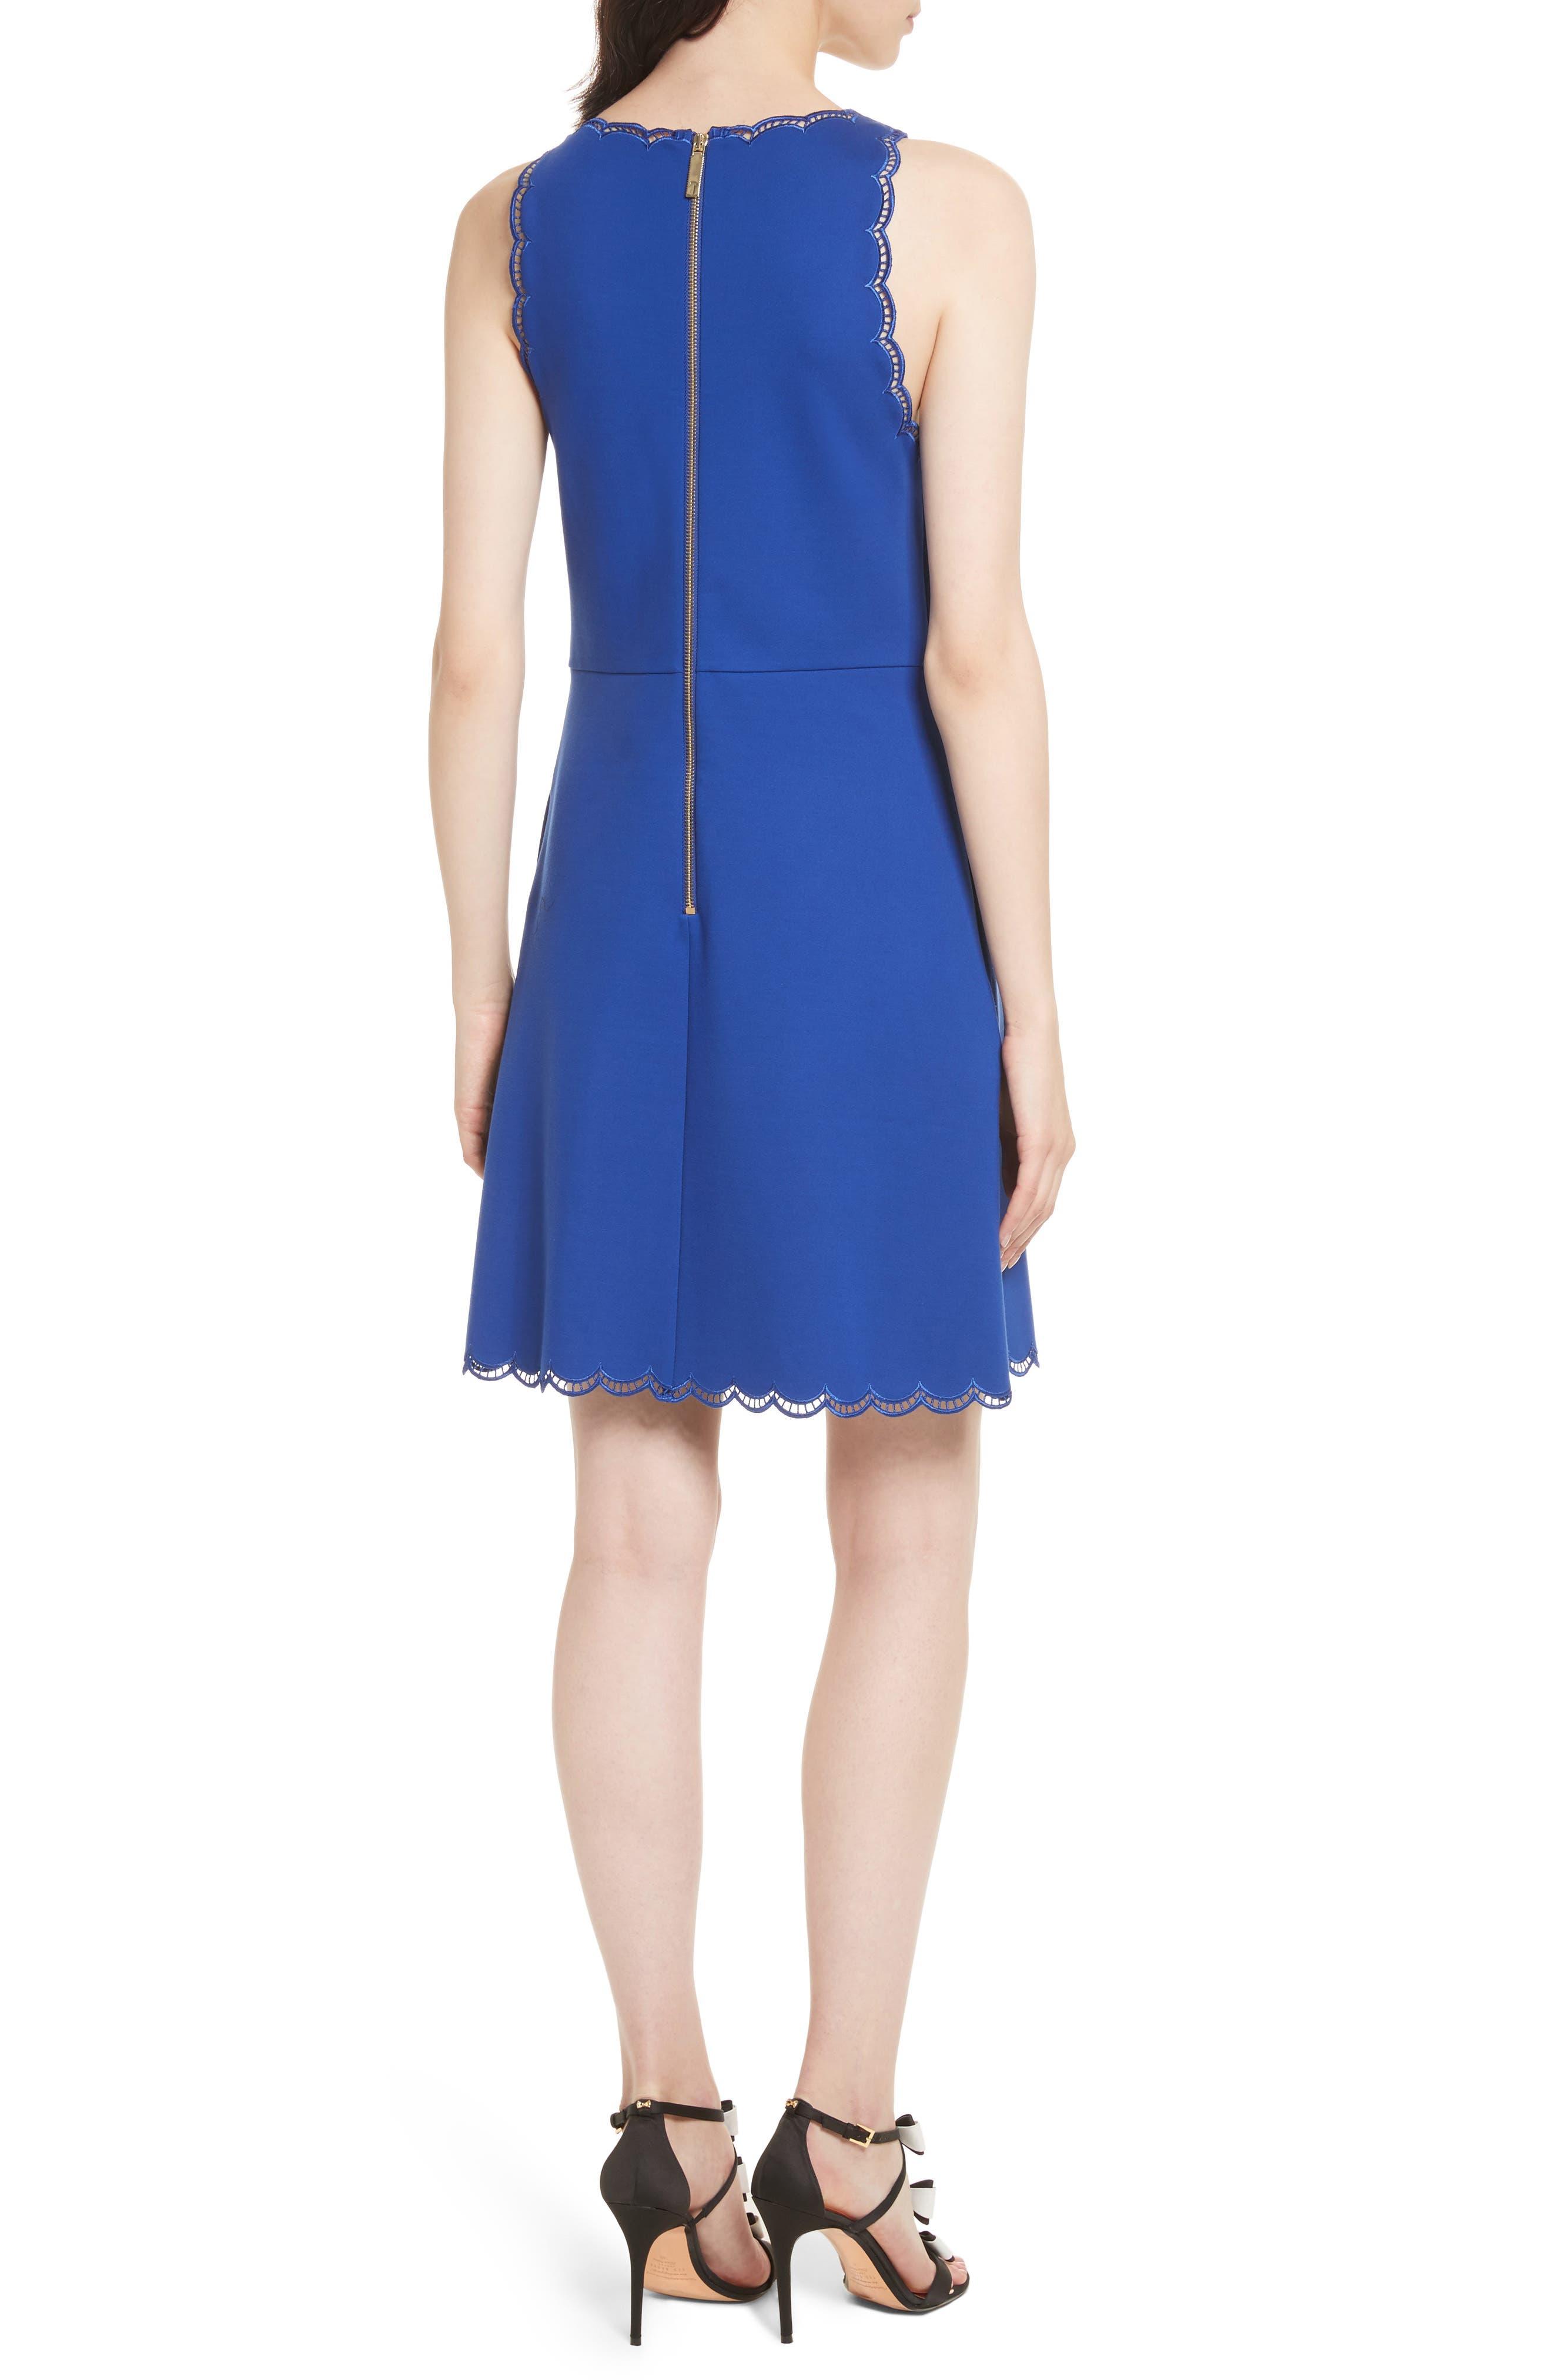 Codi Embroidered Scallop A-Line Dress,                             Alternate thumbnail 2, color,                             Mid Blue